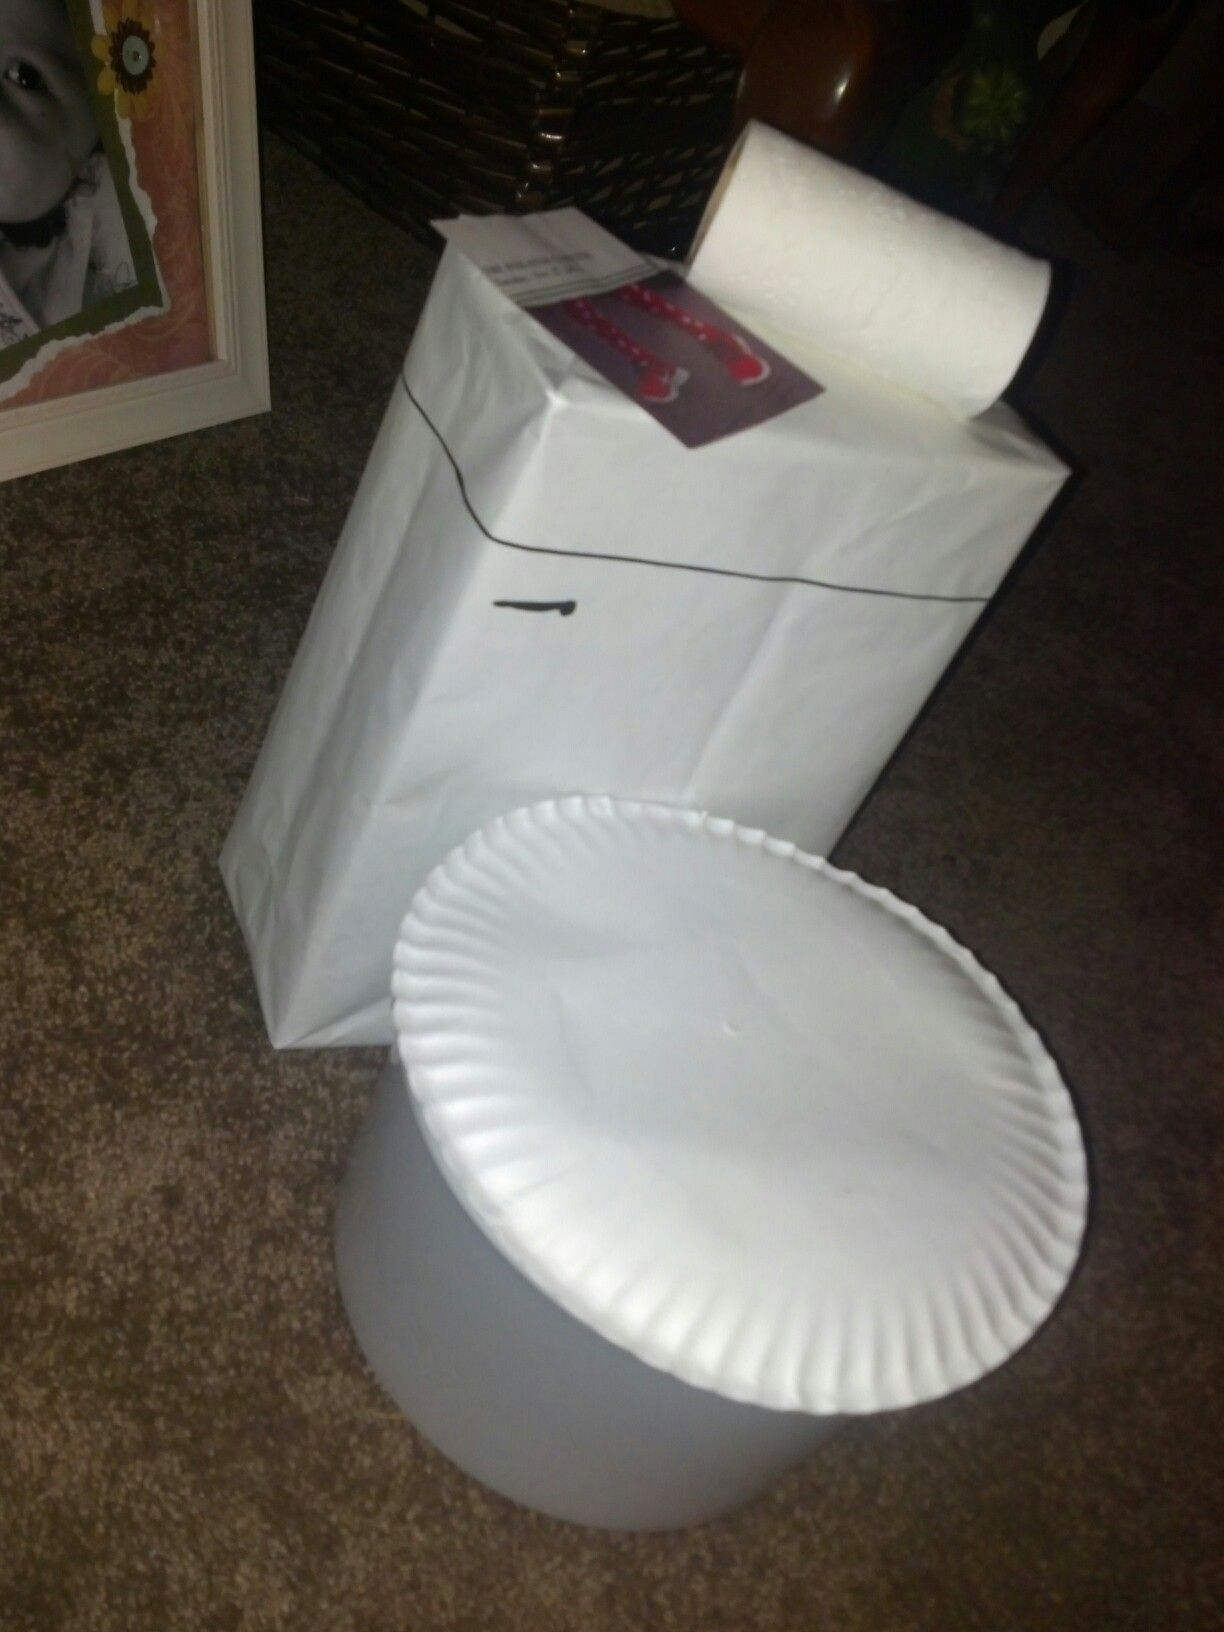 School Bathroom Fixtures caden's valentine's box. don't flush my love down the toilet